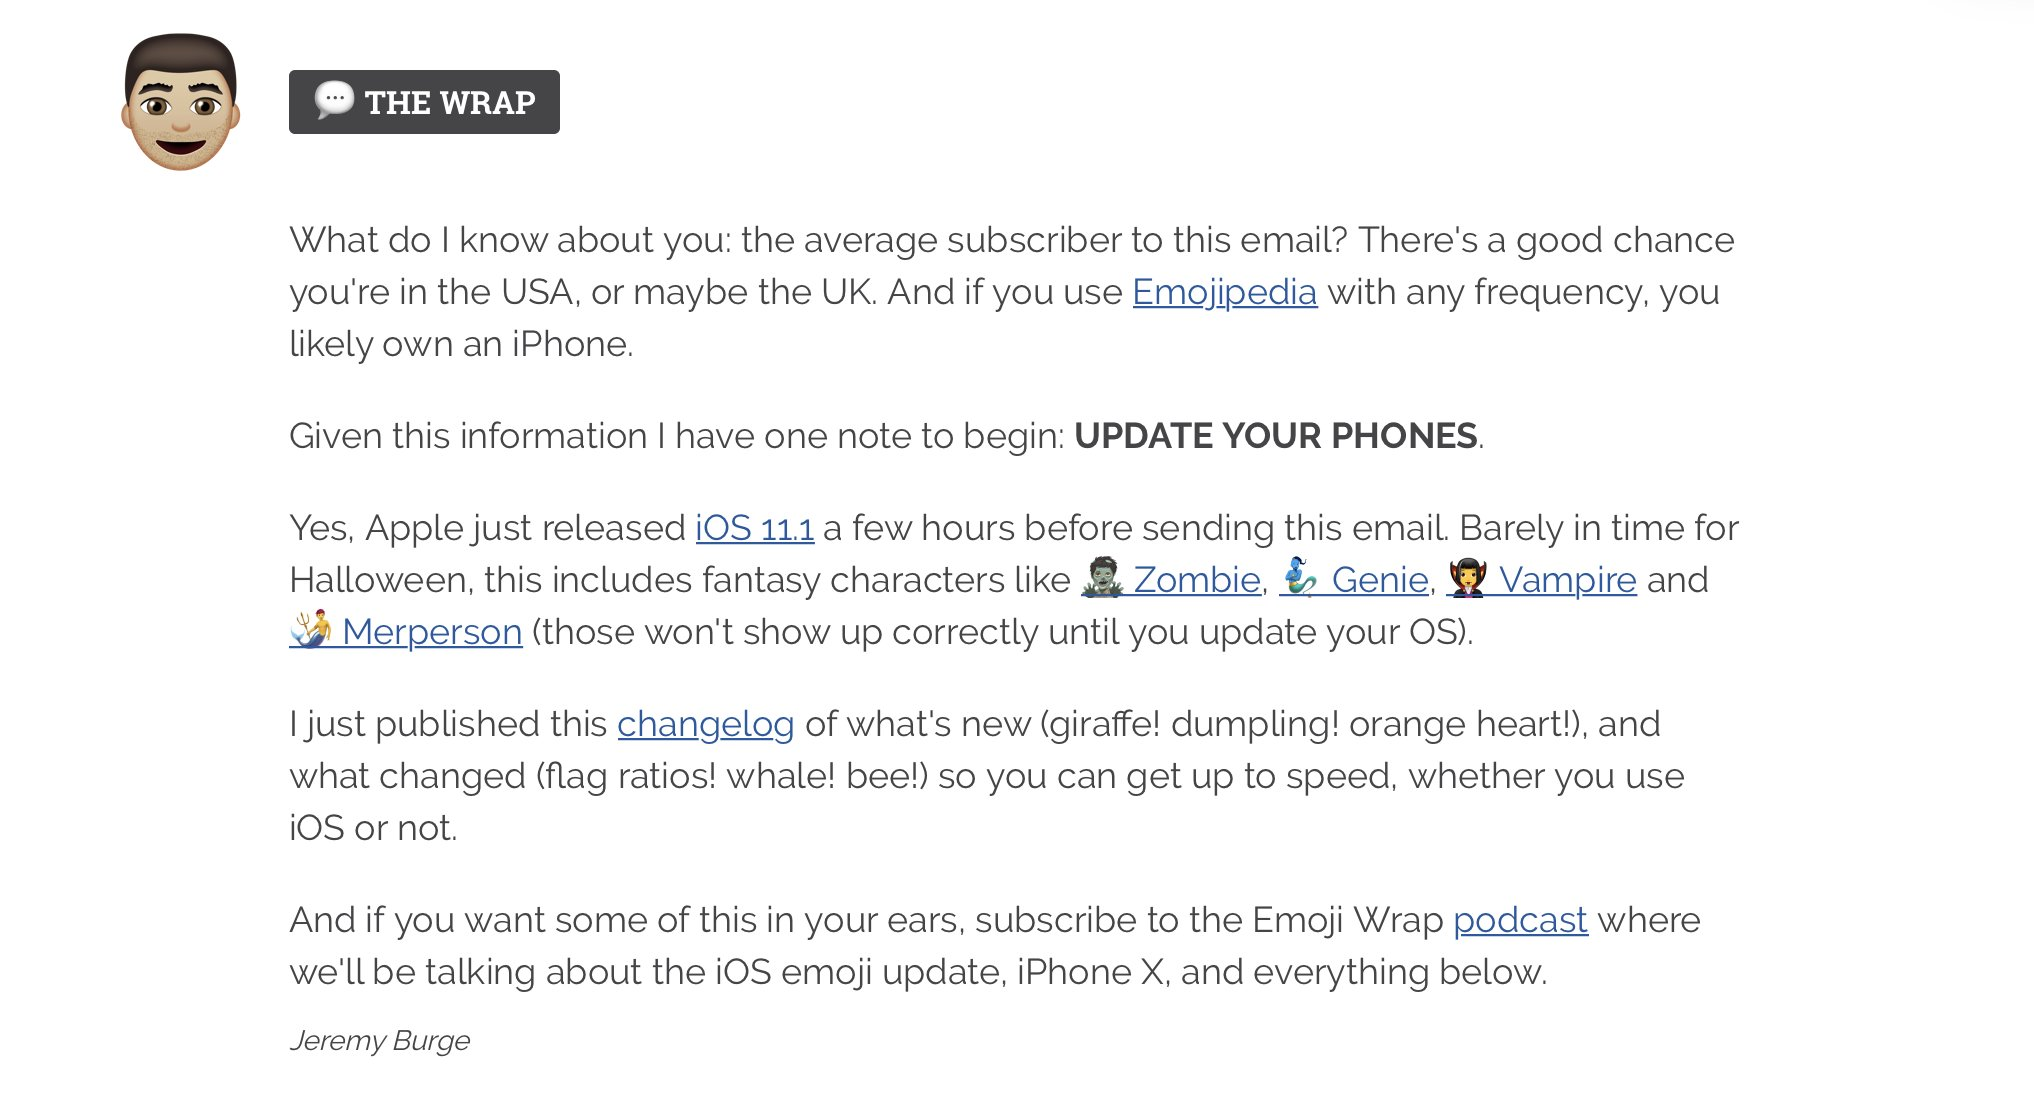 Emoji Wrap 🌯 on Twitter: